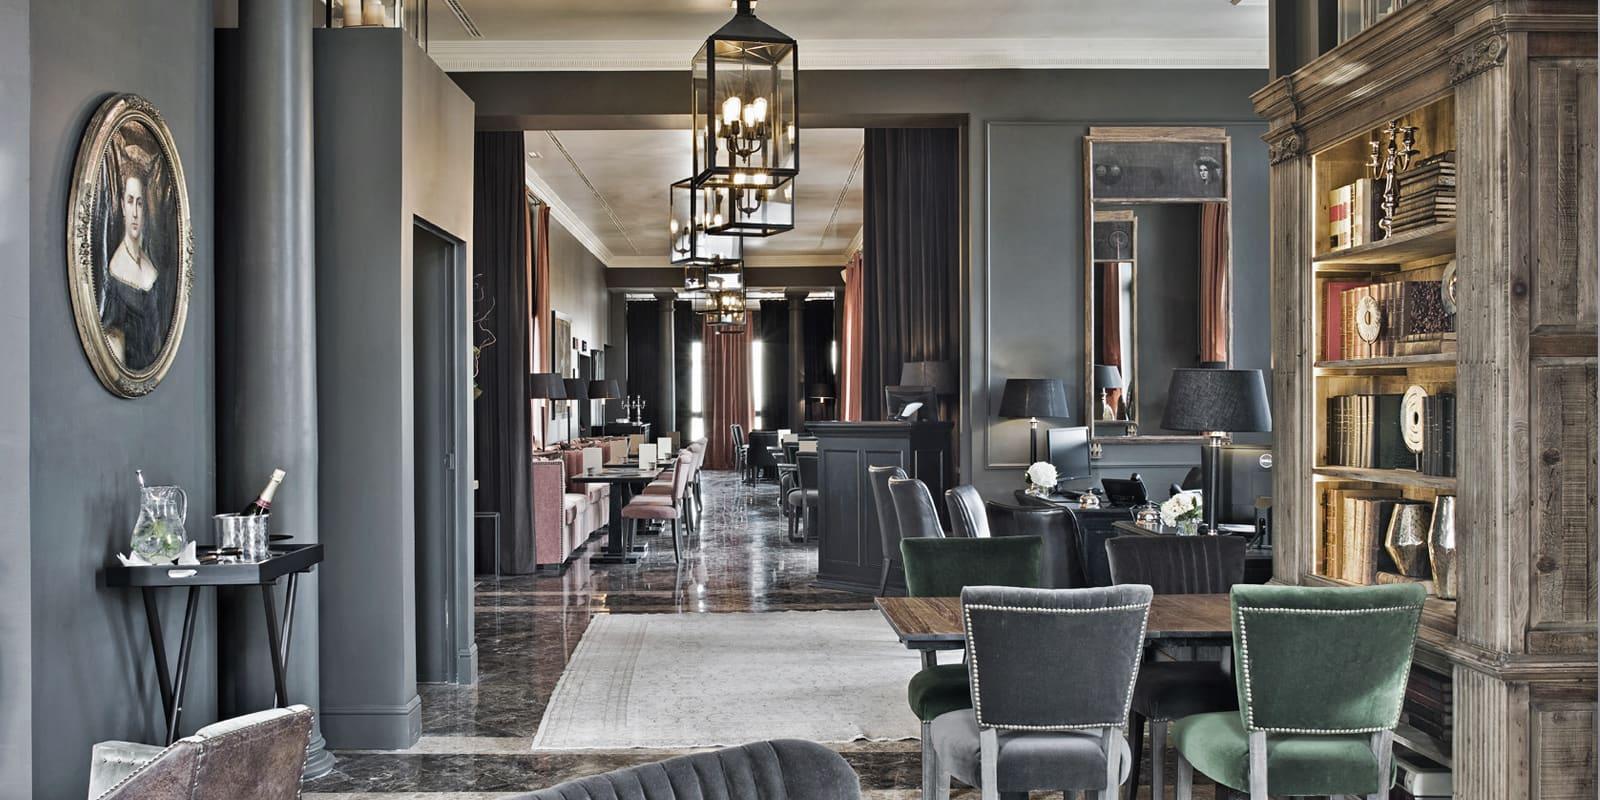 OCOA-TRAVEL-THE-PRINCIPAL-HOTEL-MADRID-6